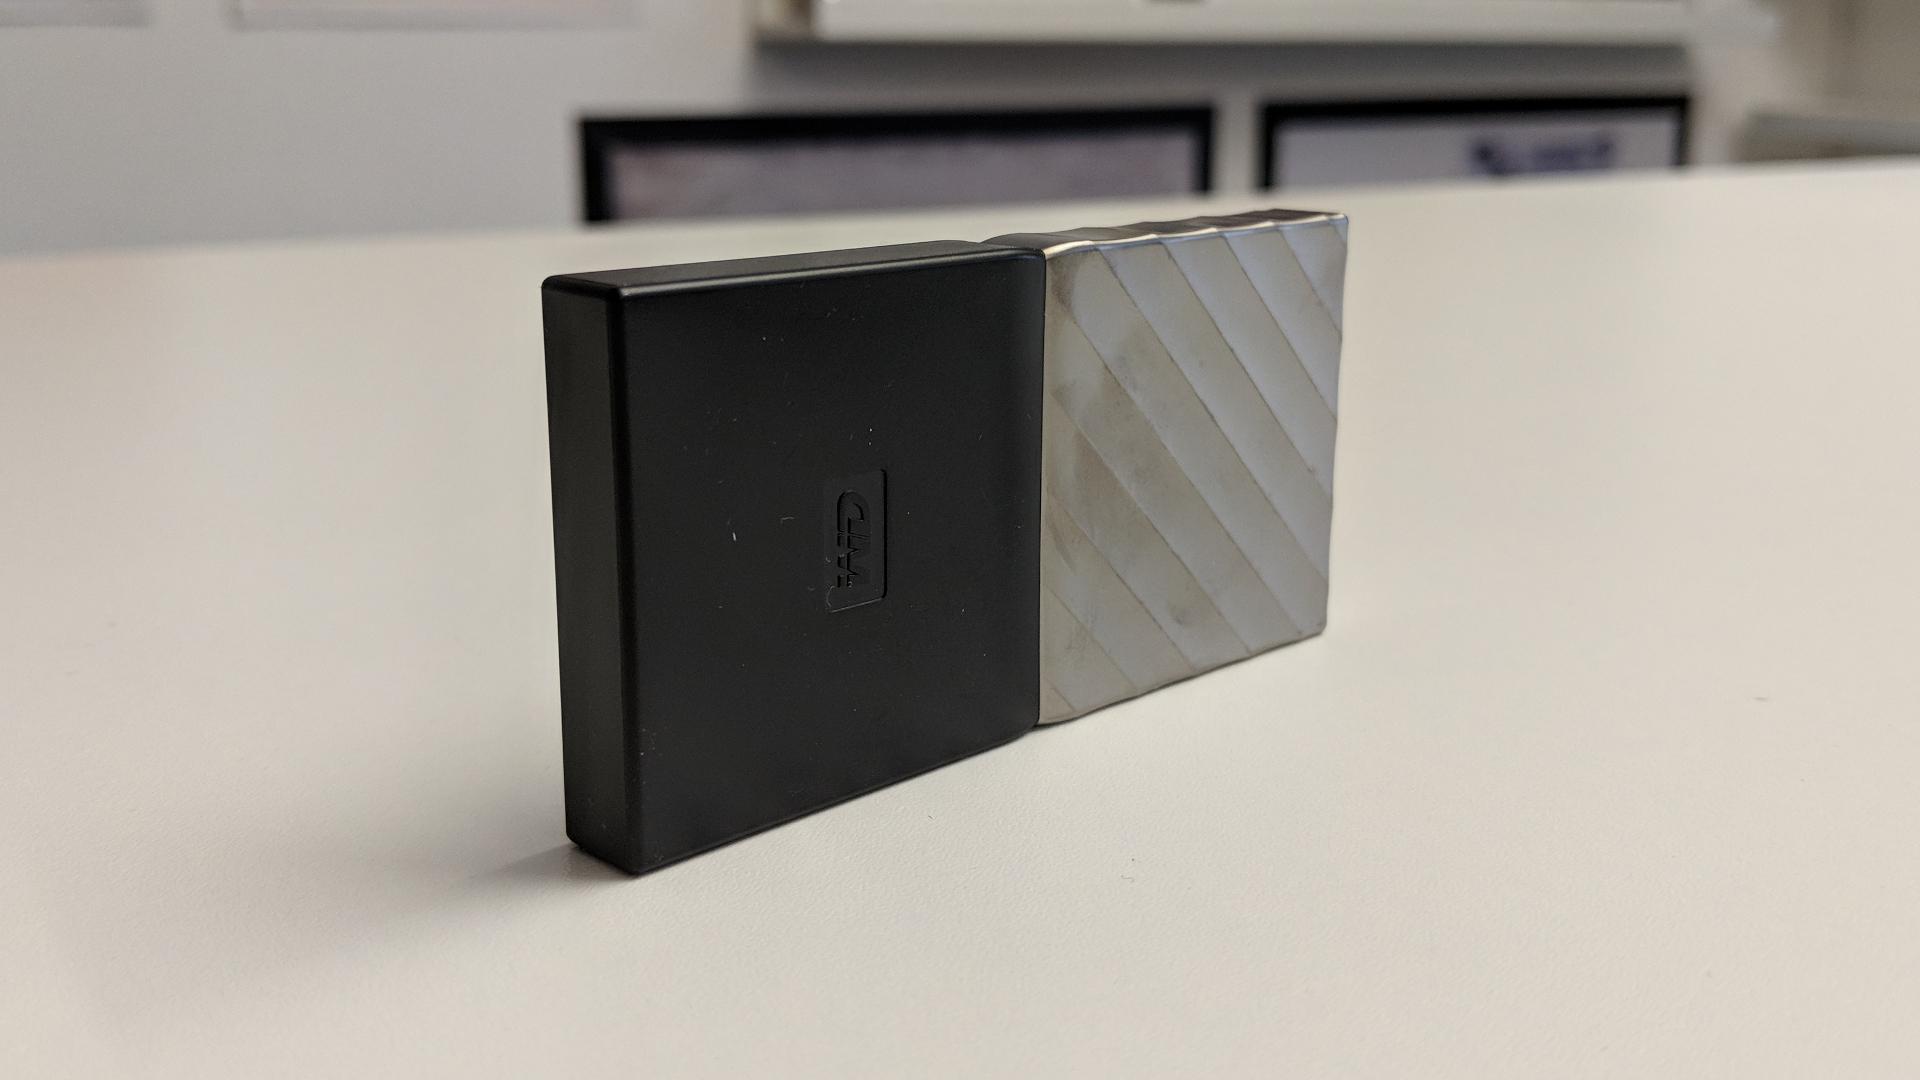 WD My Passport SSD review | TechRadar